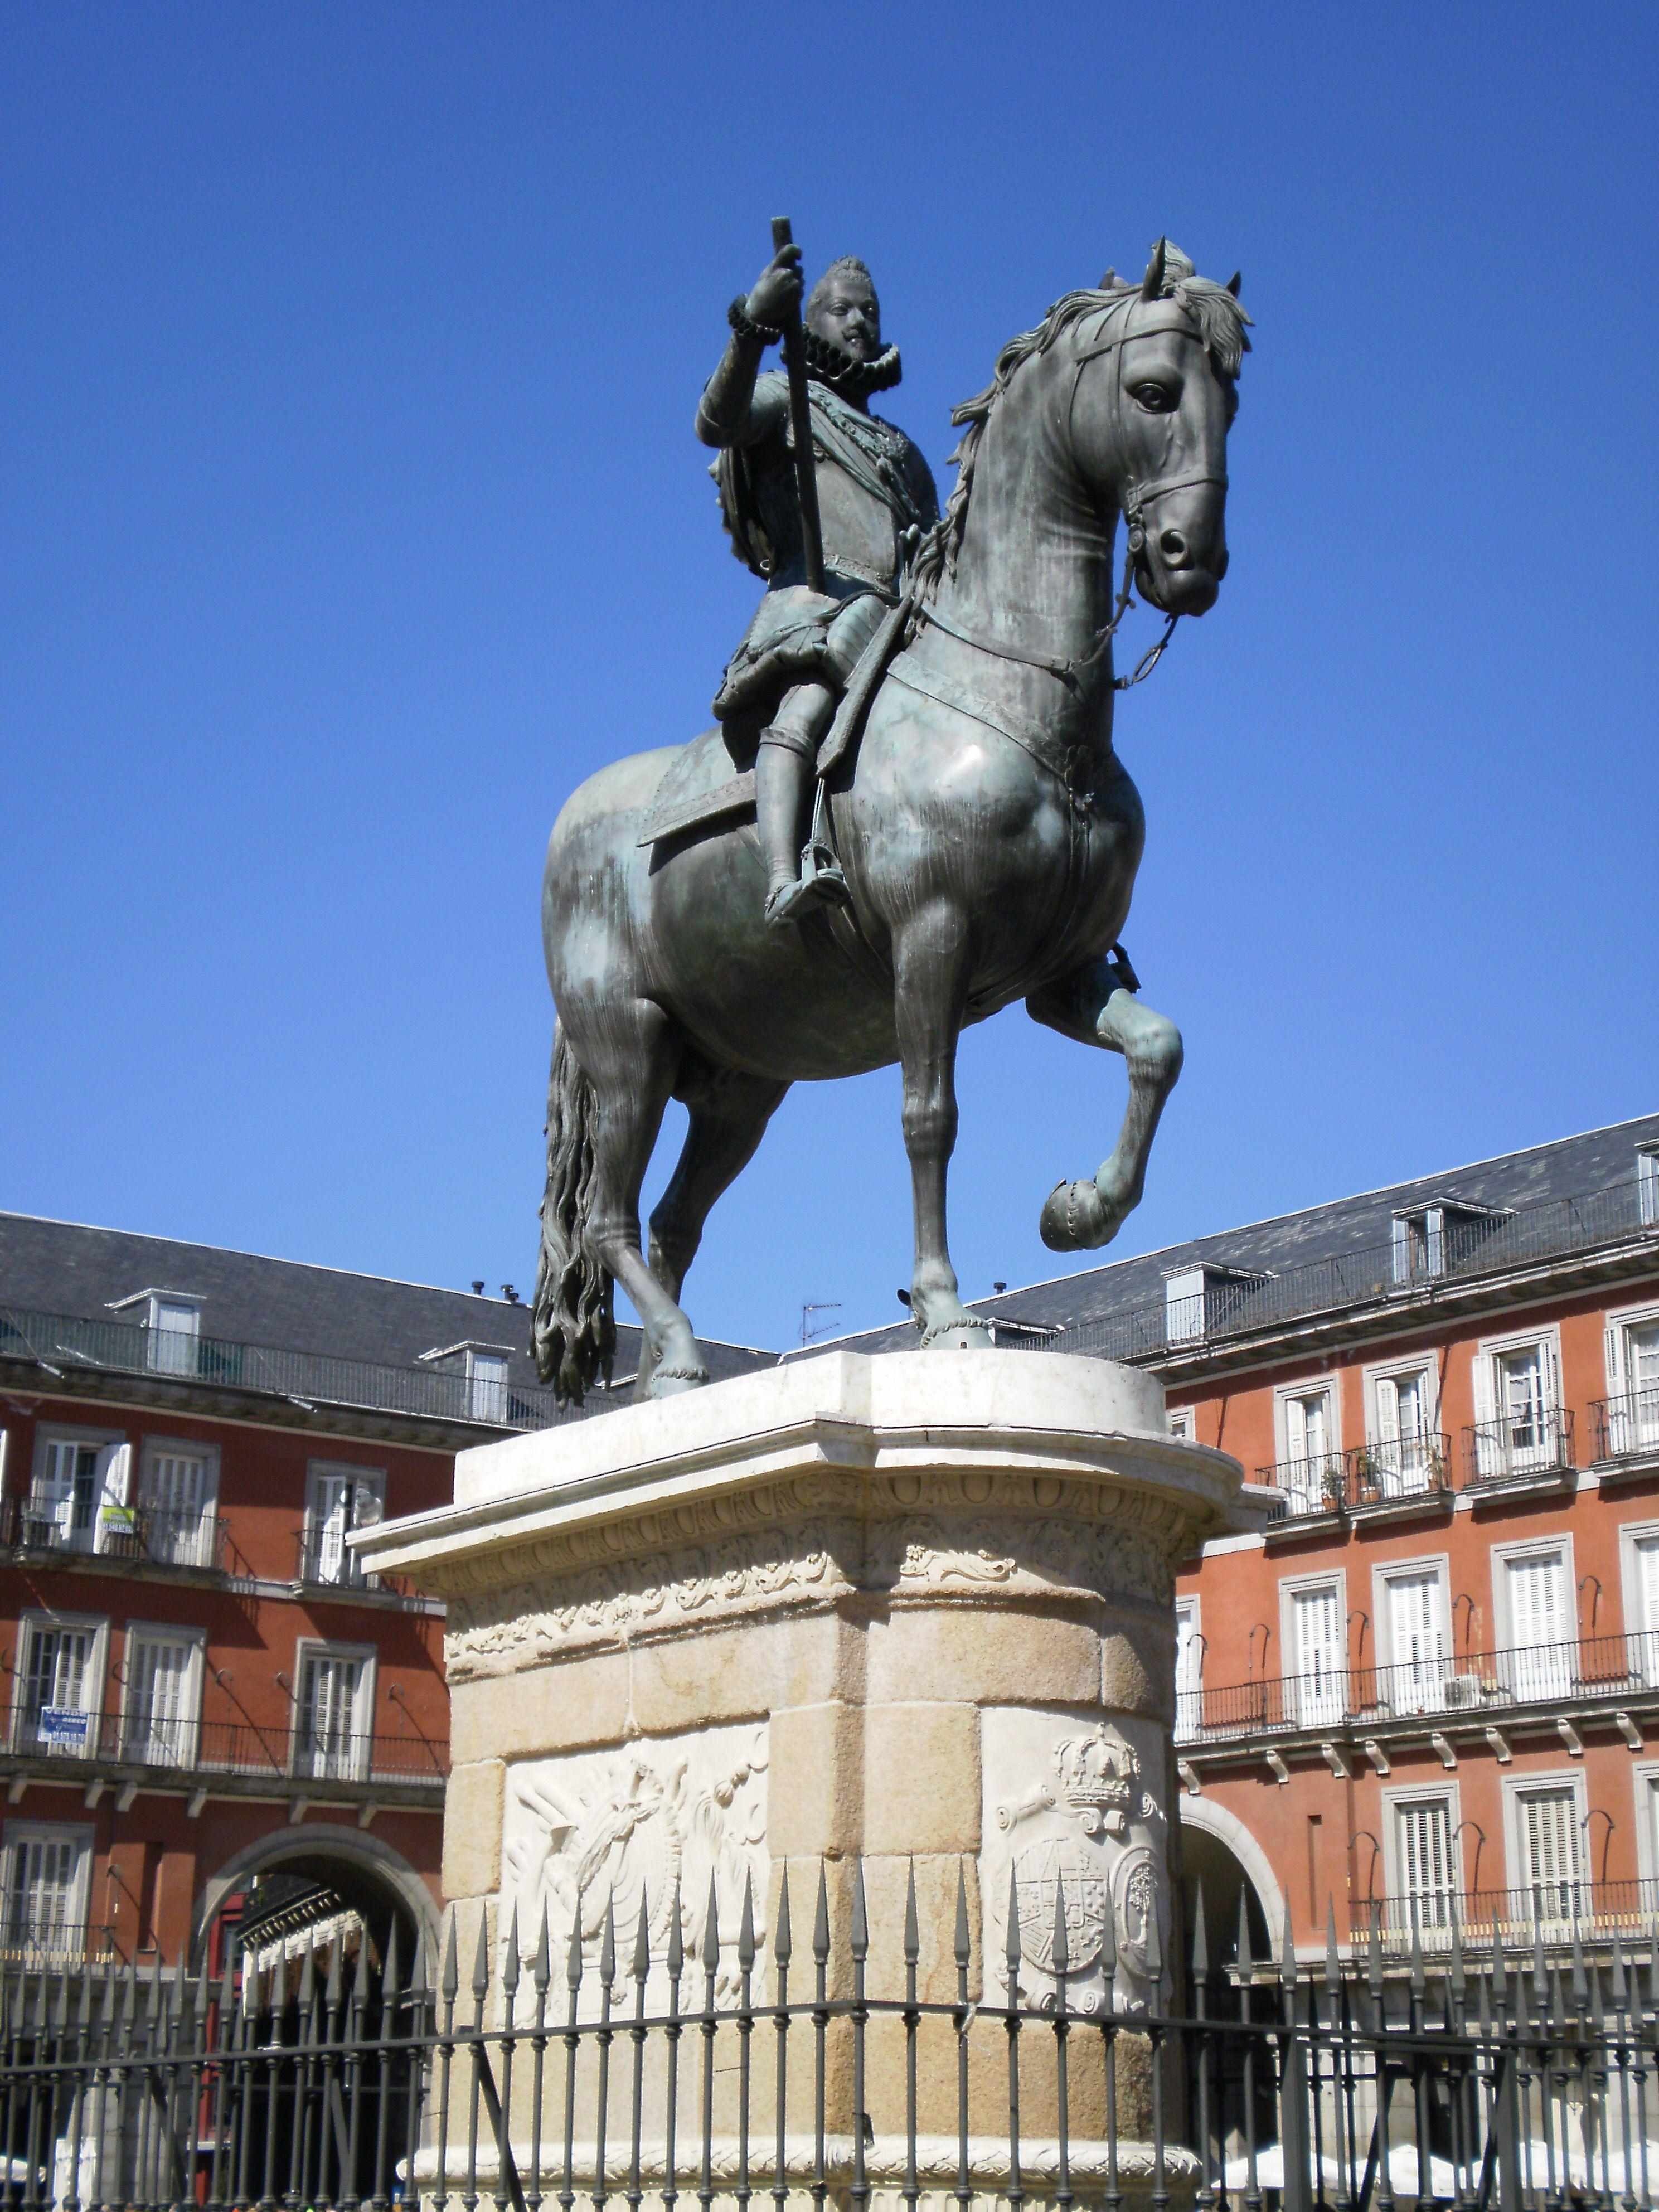 File:Statue of Philip III of Spain, Madrid 02.JPG